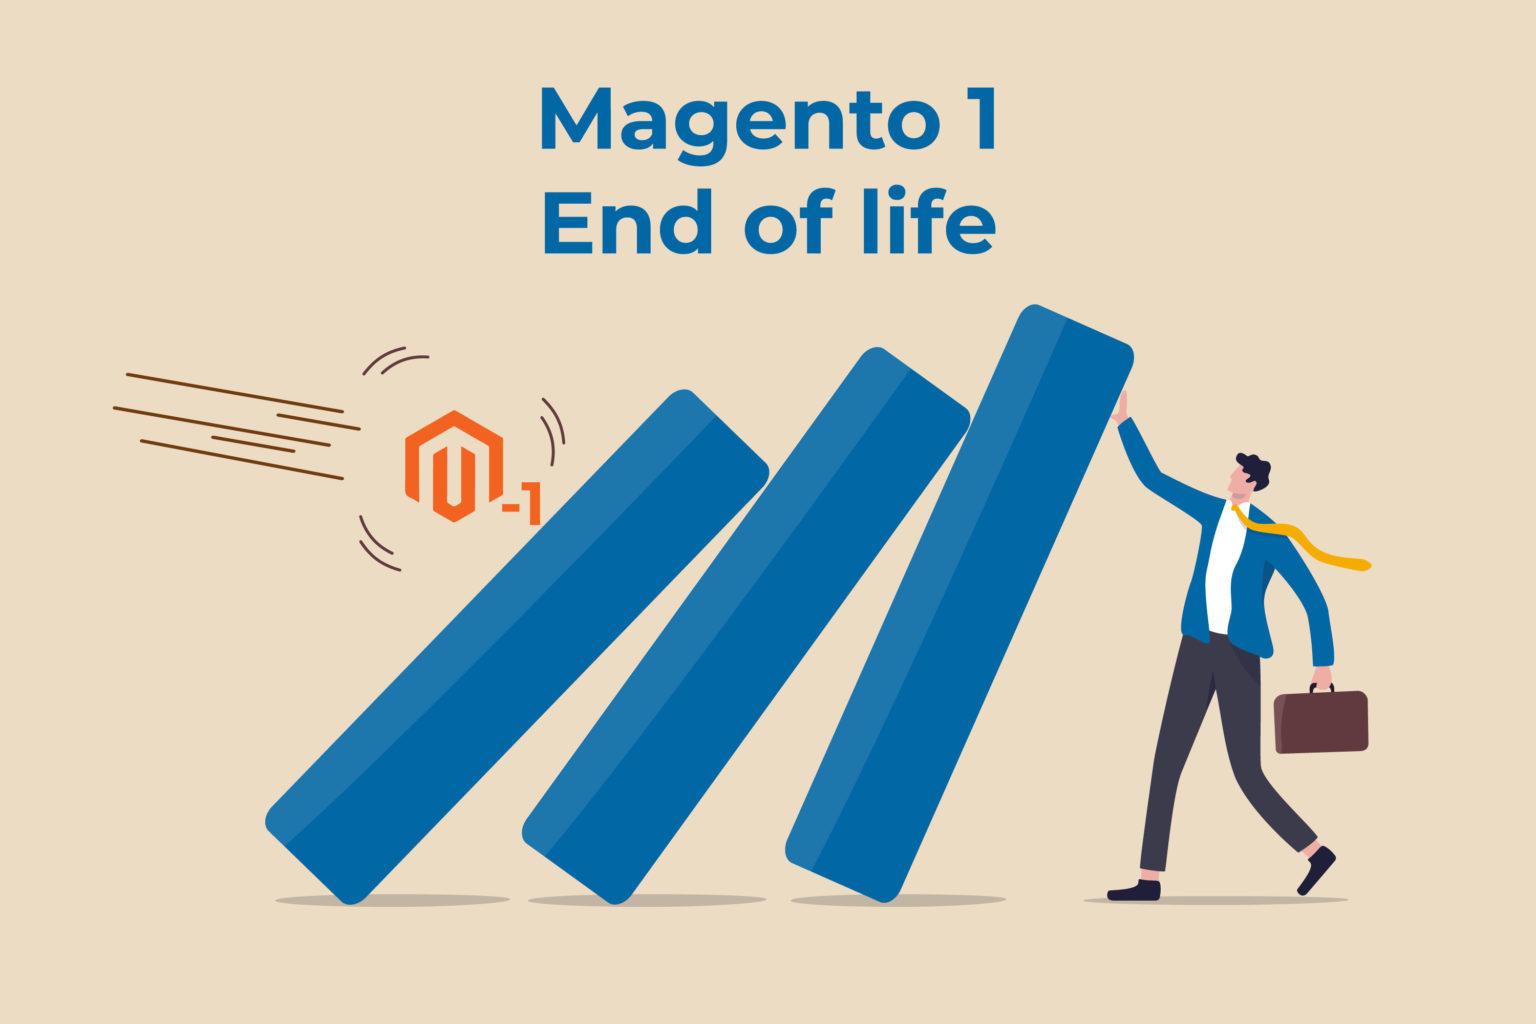 Magento Migration Apprehensions? – Worry No More!